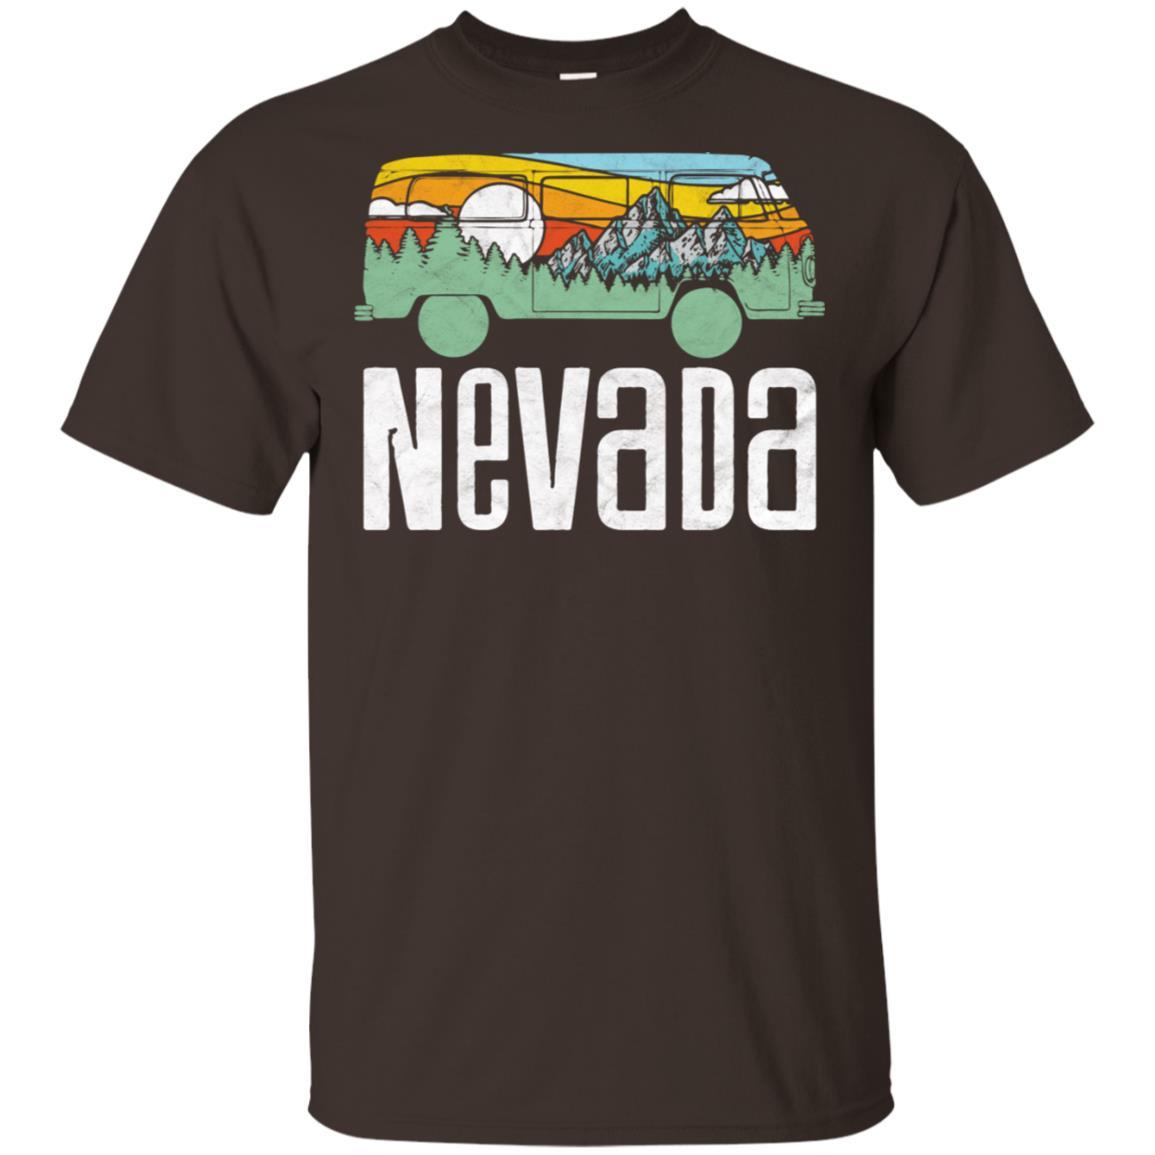 Retro Nevada Outdoor Hippie Van Nature Tee Unisex Short Sleeve